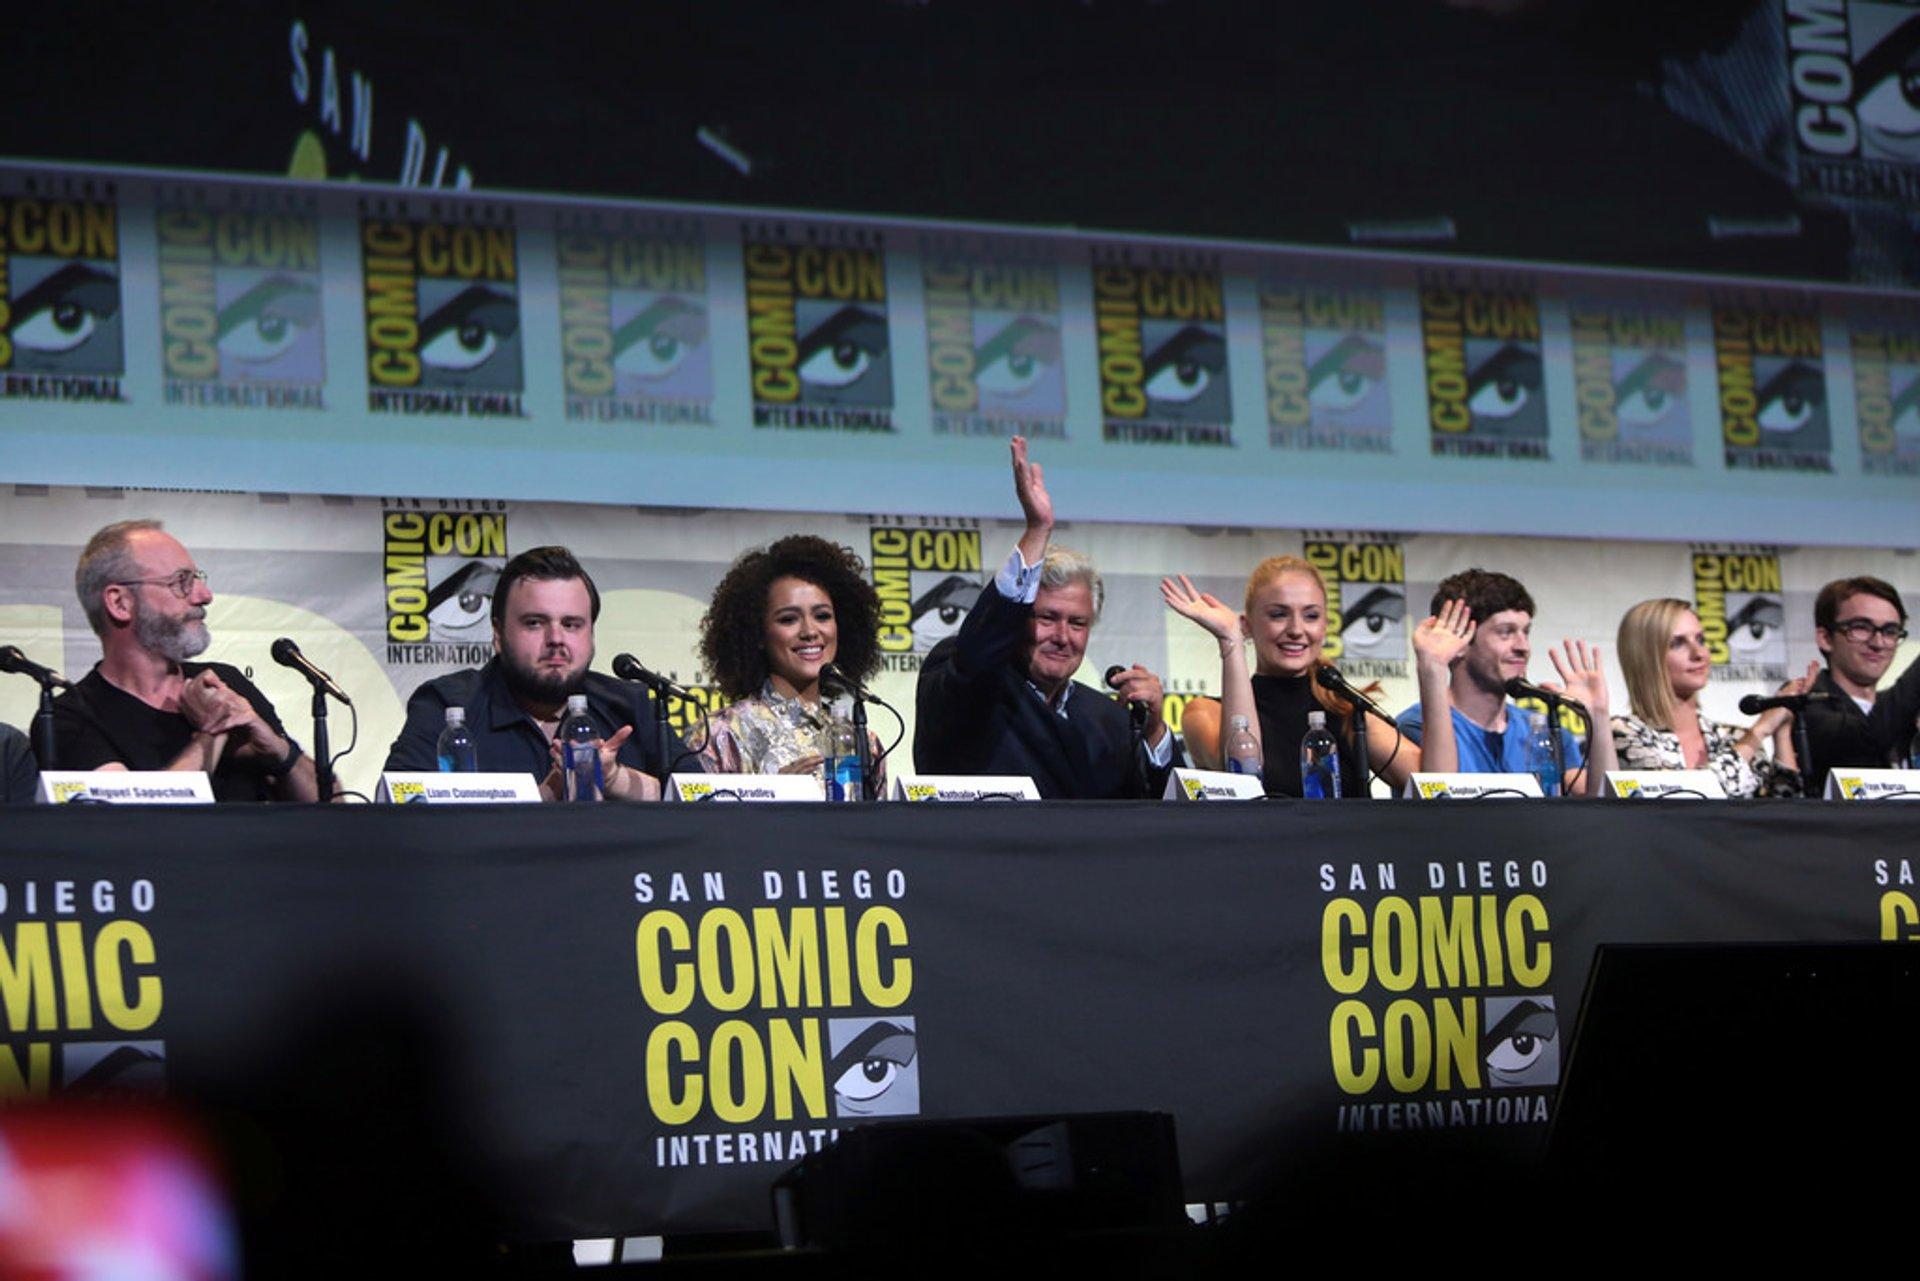 Comic-Con International in California - Best Season 2019